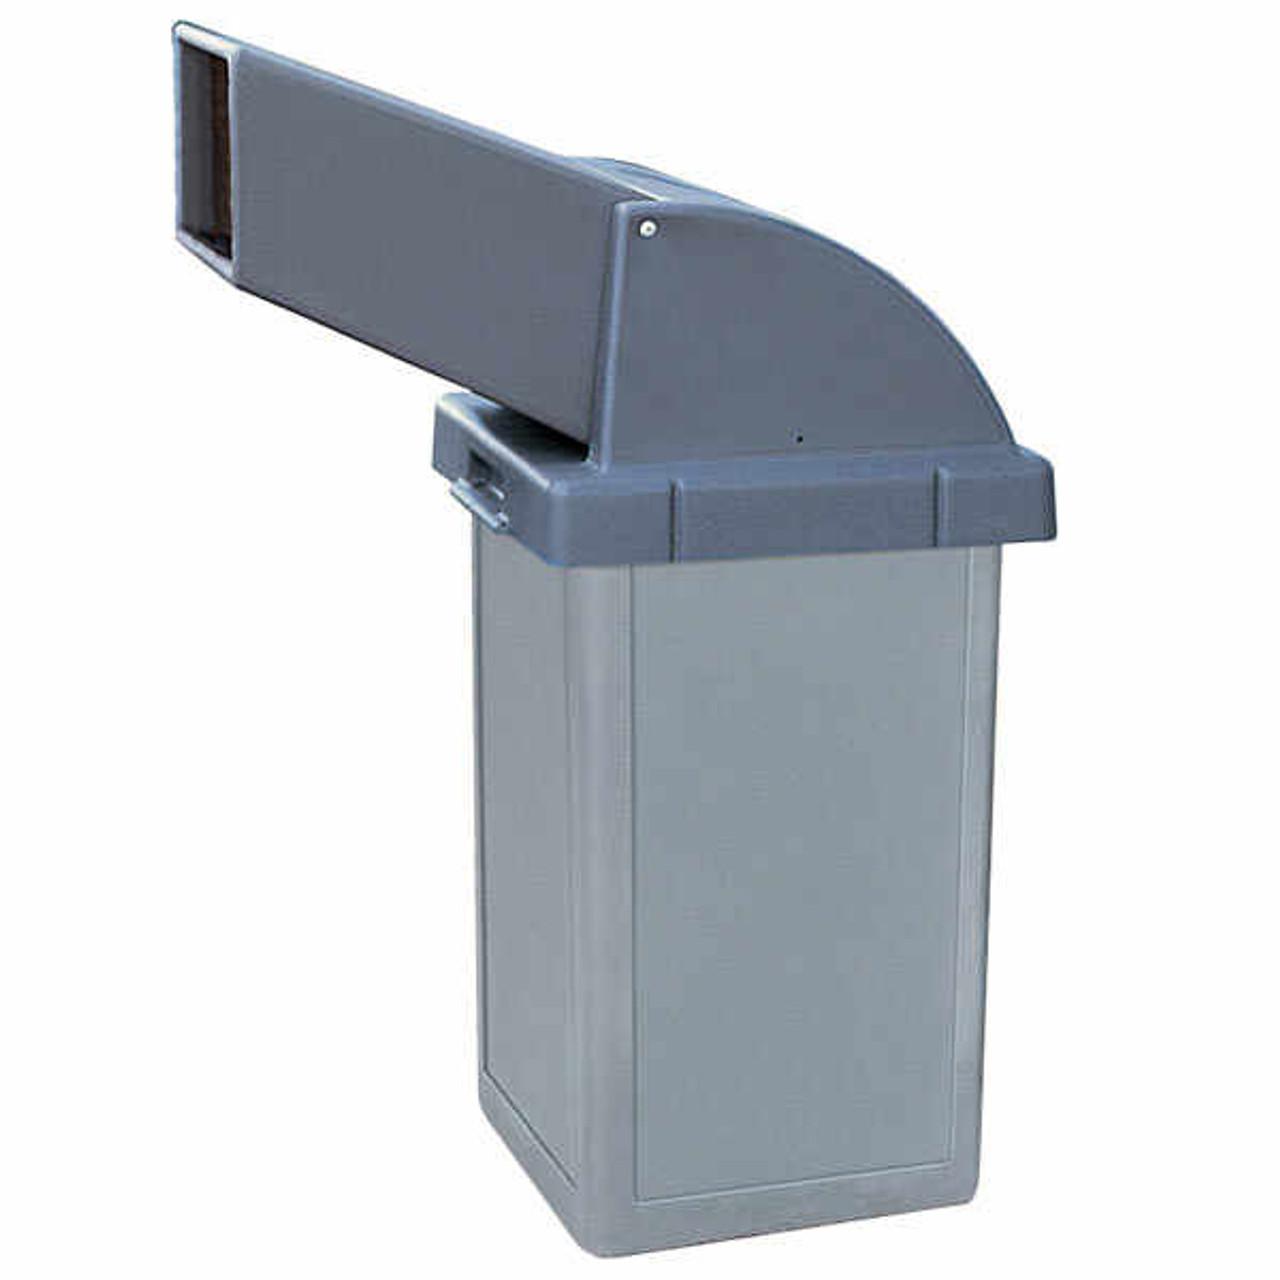 24 Gallon Heavy Duty Plastic Drive Thru Top Waste Container TF1018